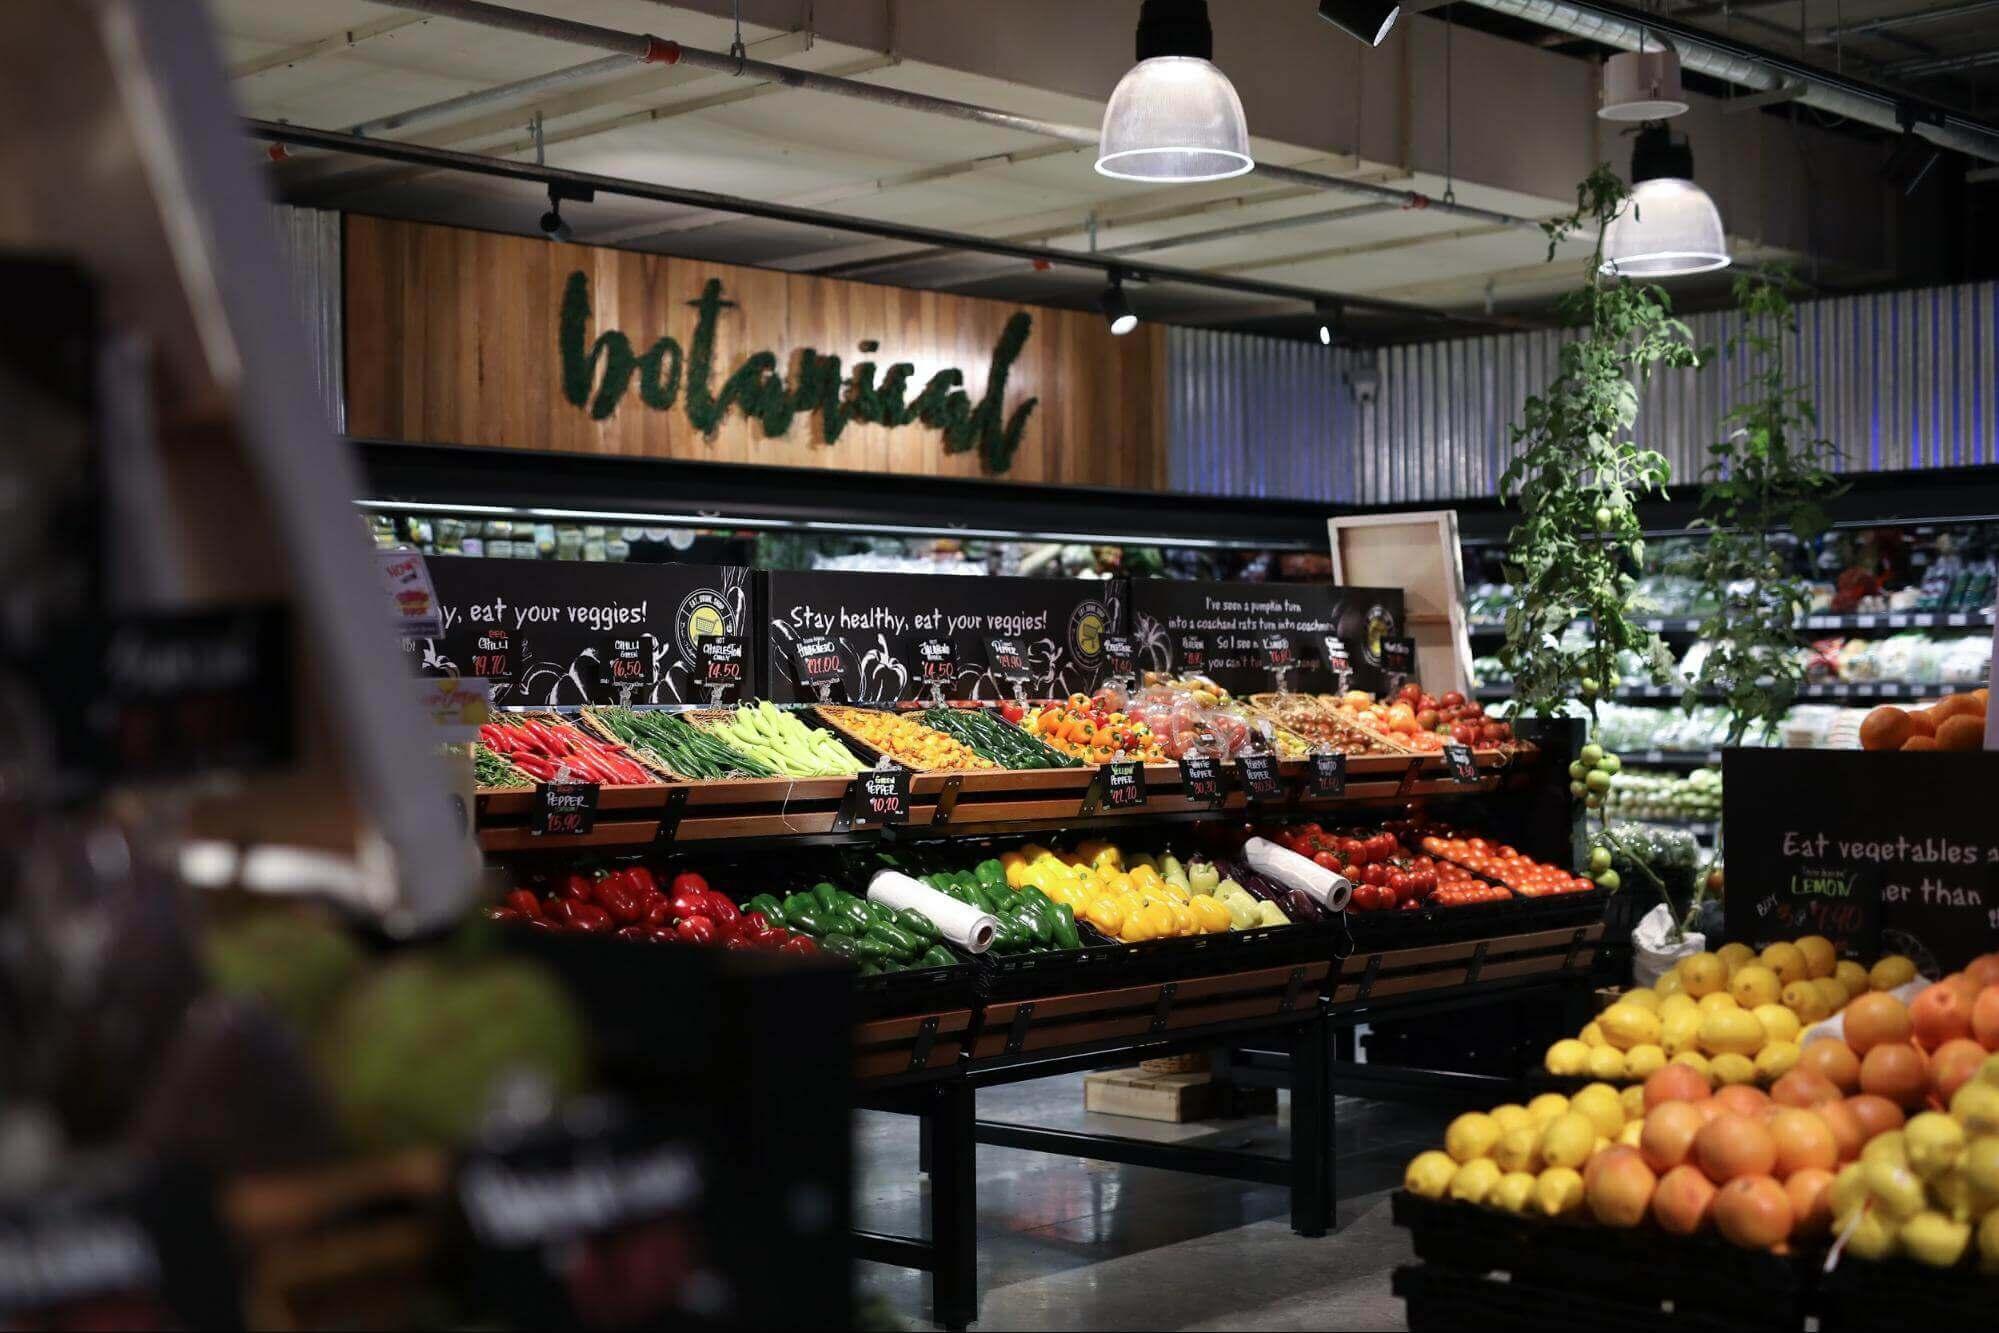 Ben's Independent Grocer fruit section